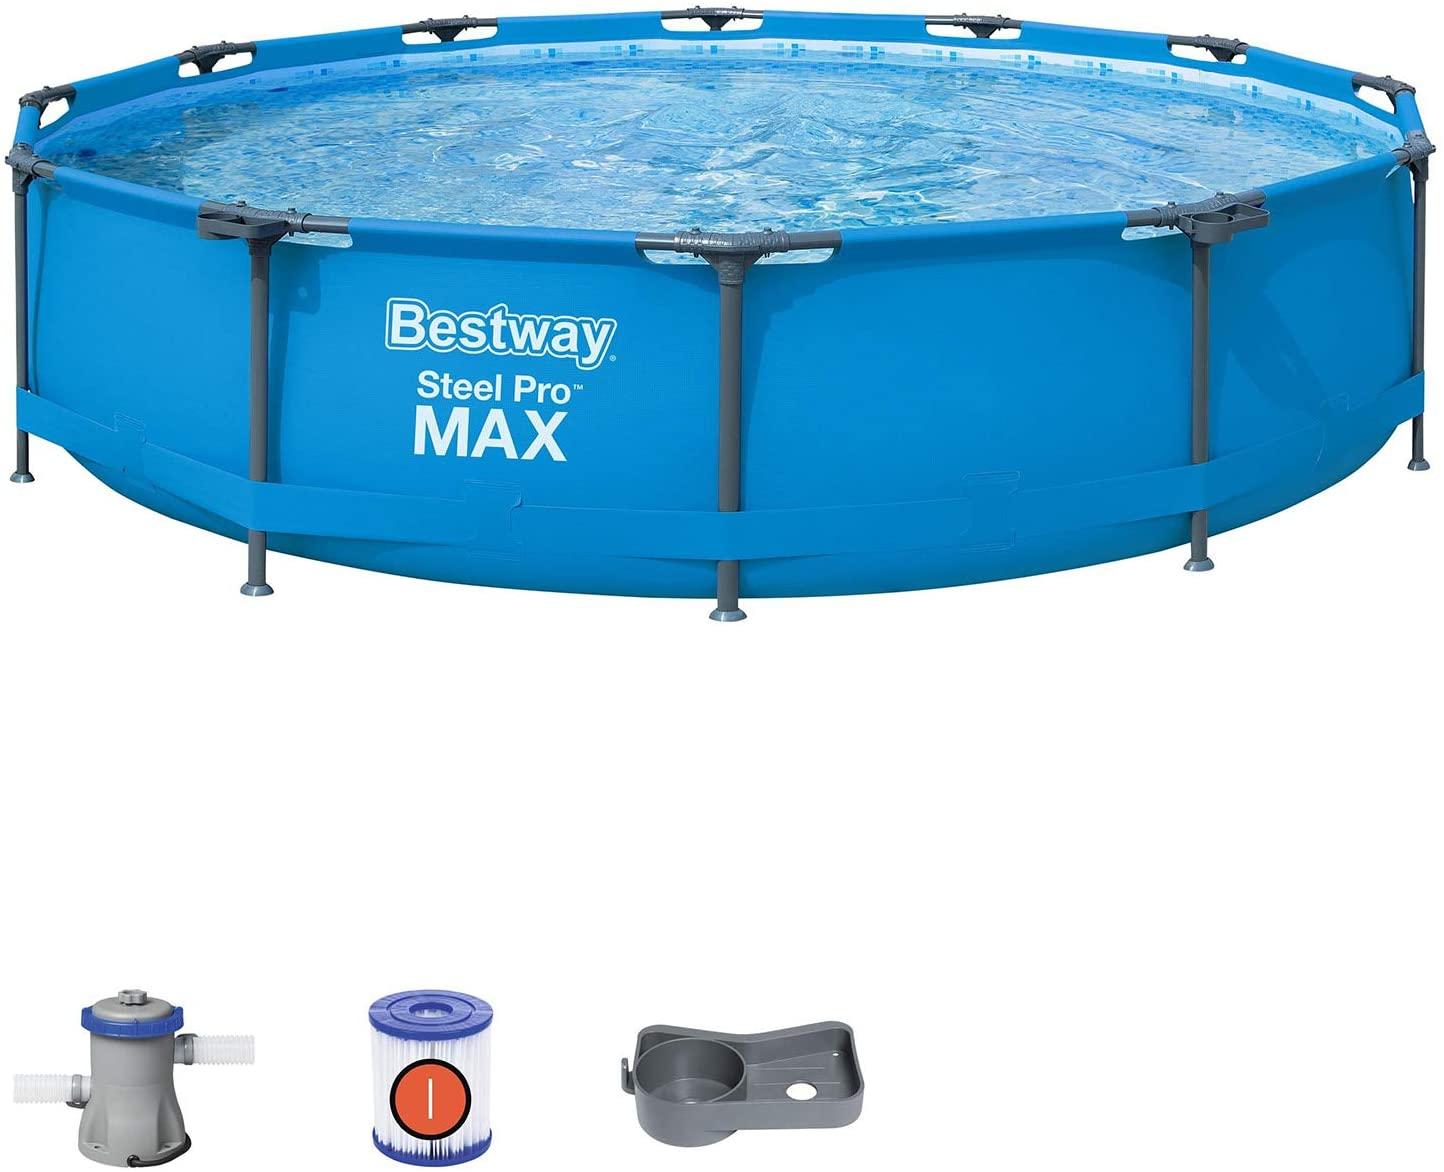 Bestway 56416 Steel Pro MAX